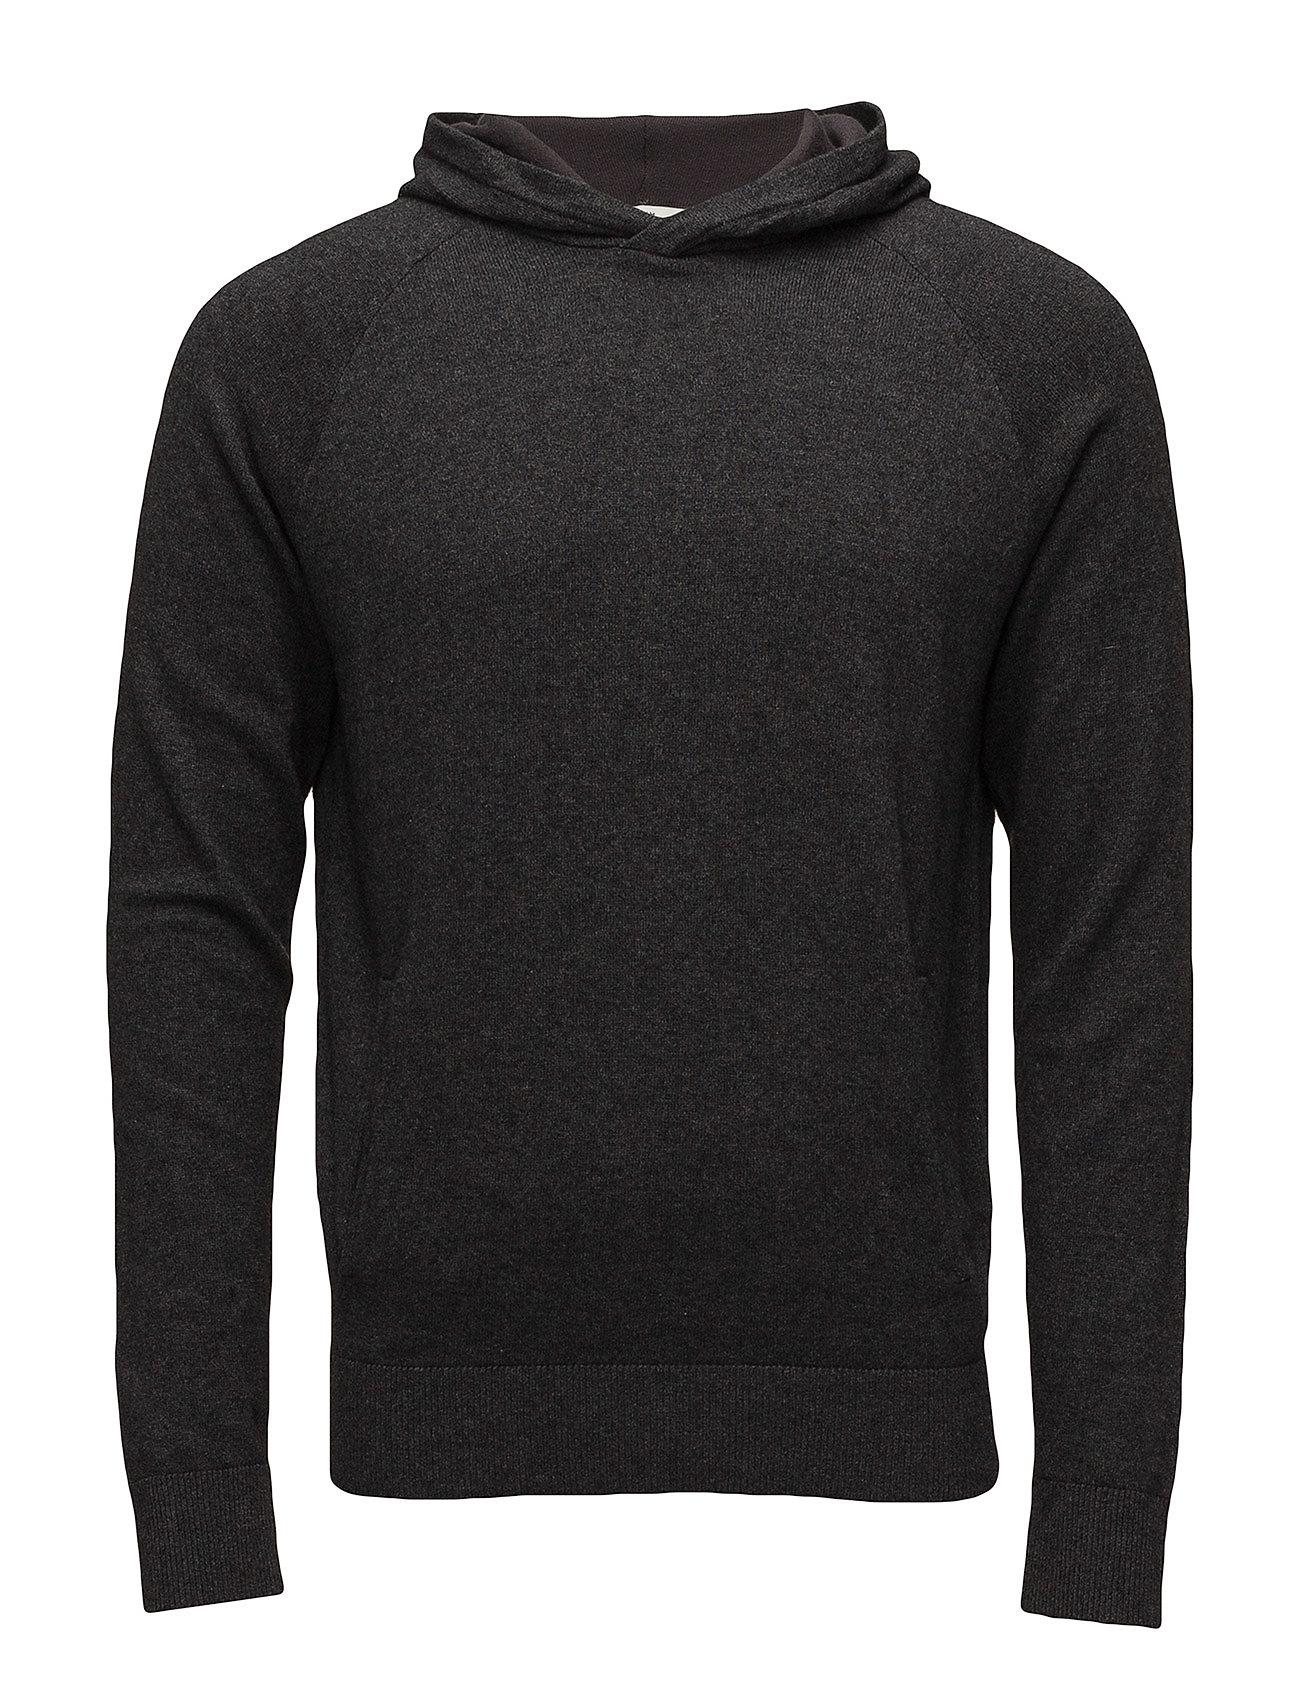 jack & jones premium – Jprharold knit hoodie på boozt.com dk